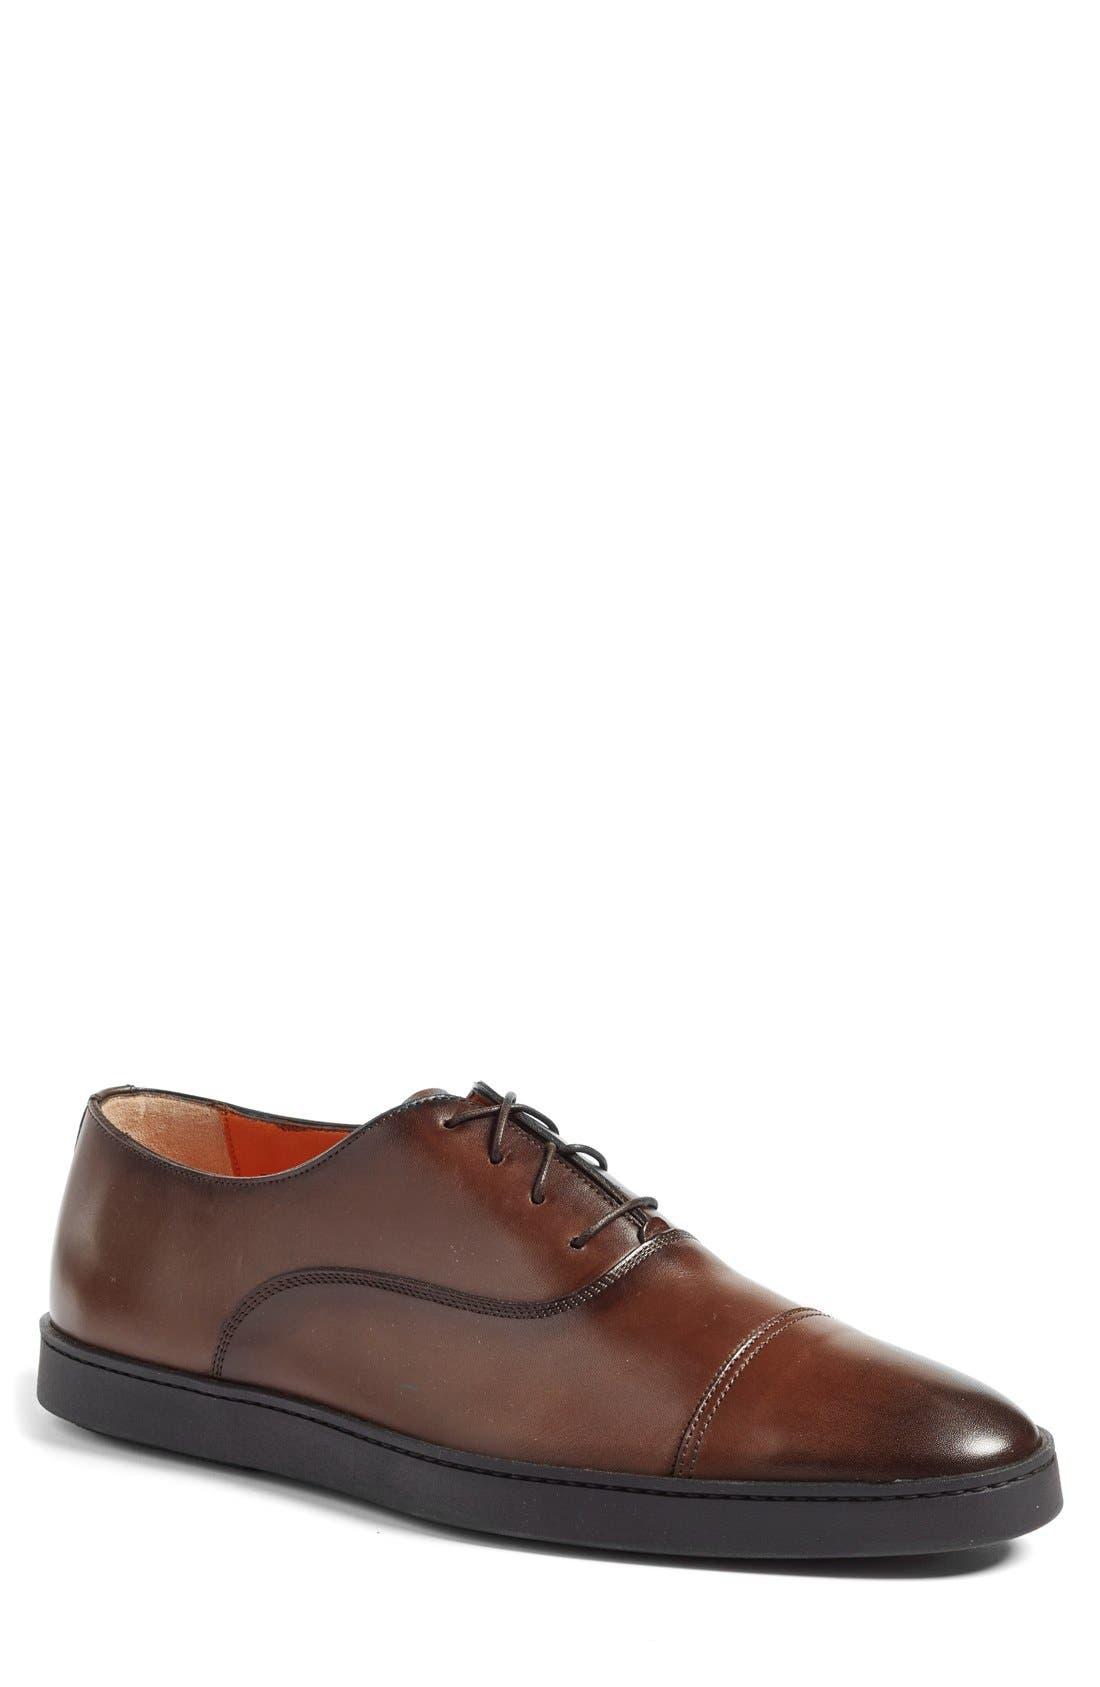 'Durbin' Oxford Sneaker,                             Alternate thumbnail 3, color,                             209